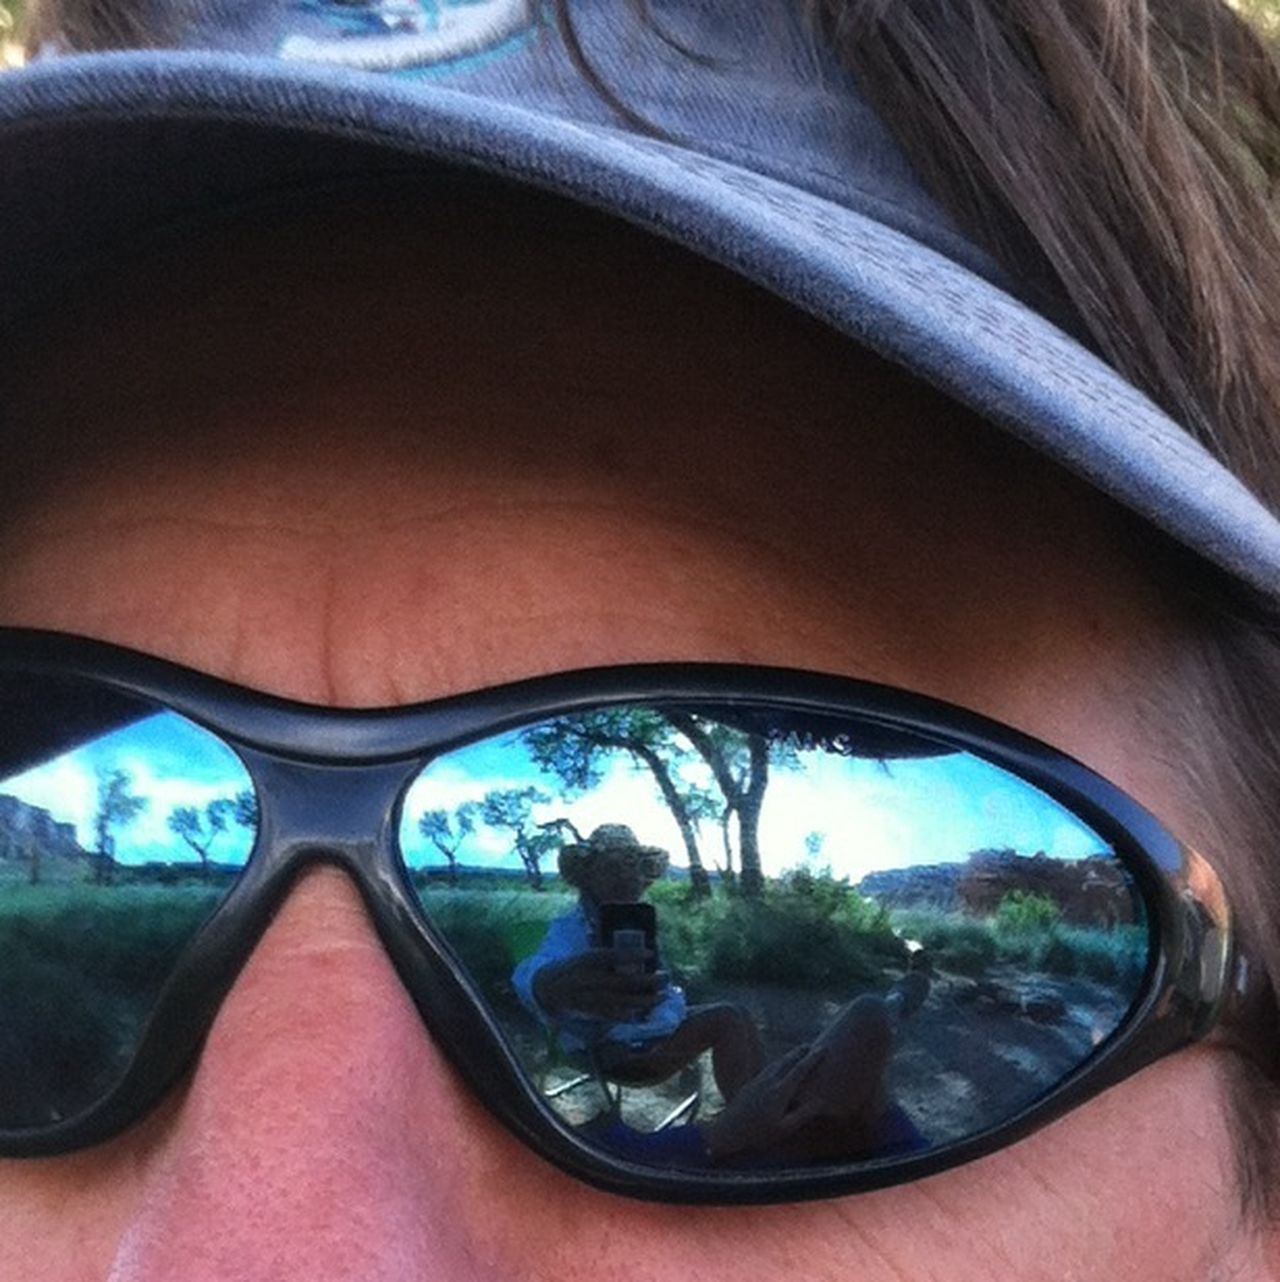 Cottonwoods and meadow. EyeEm Best Shots Reflection Eye4photography  The Explorer - 2014 EyeEm Awards